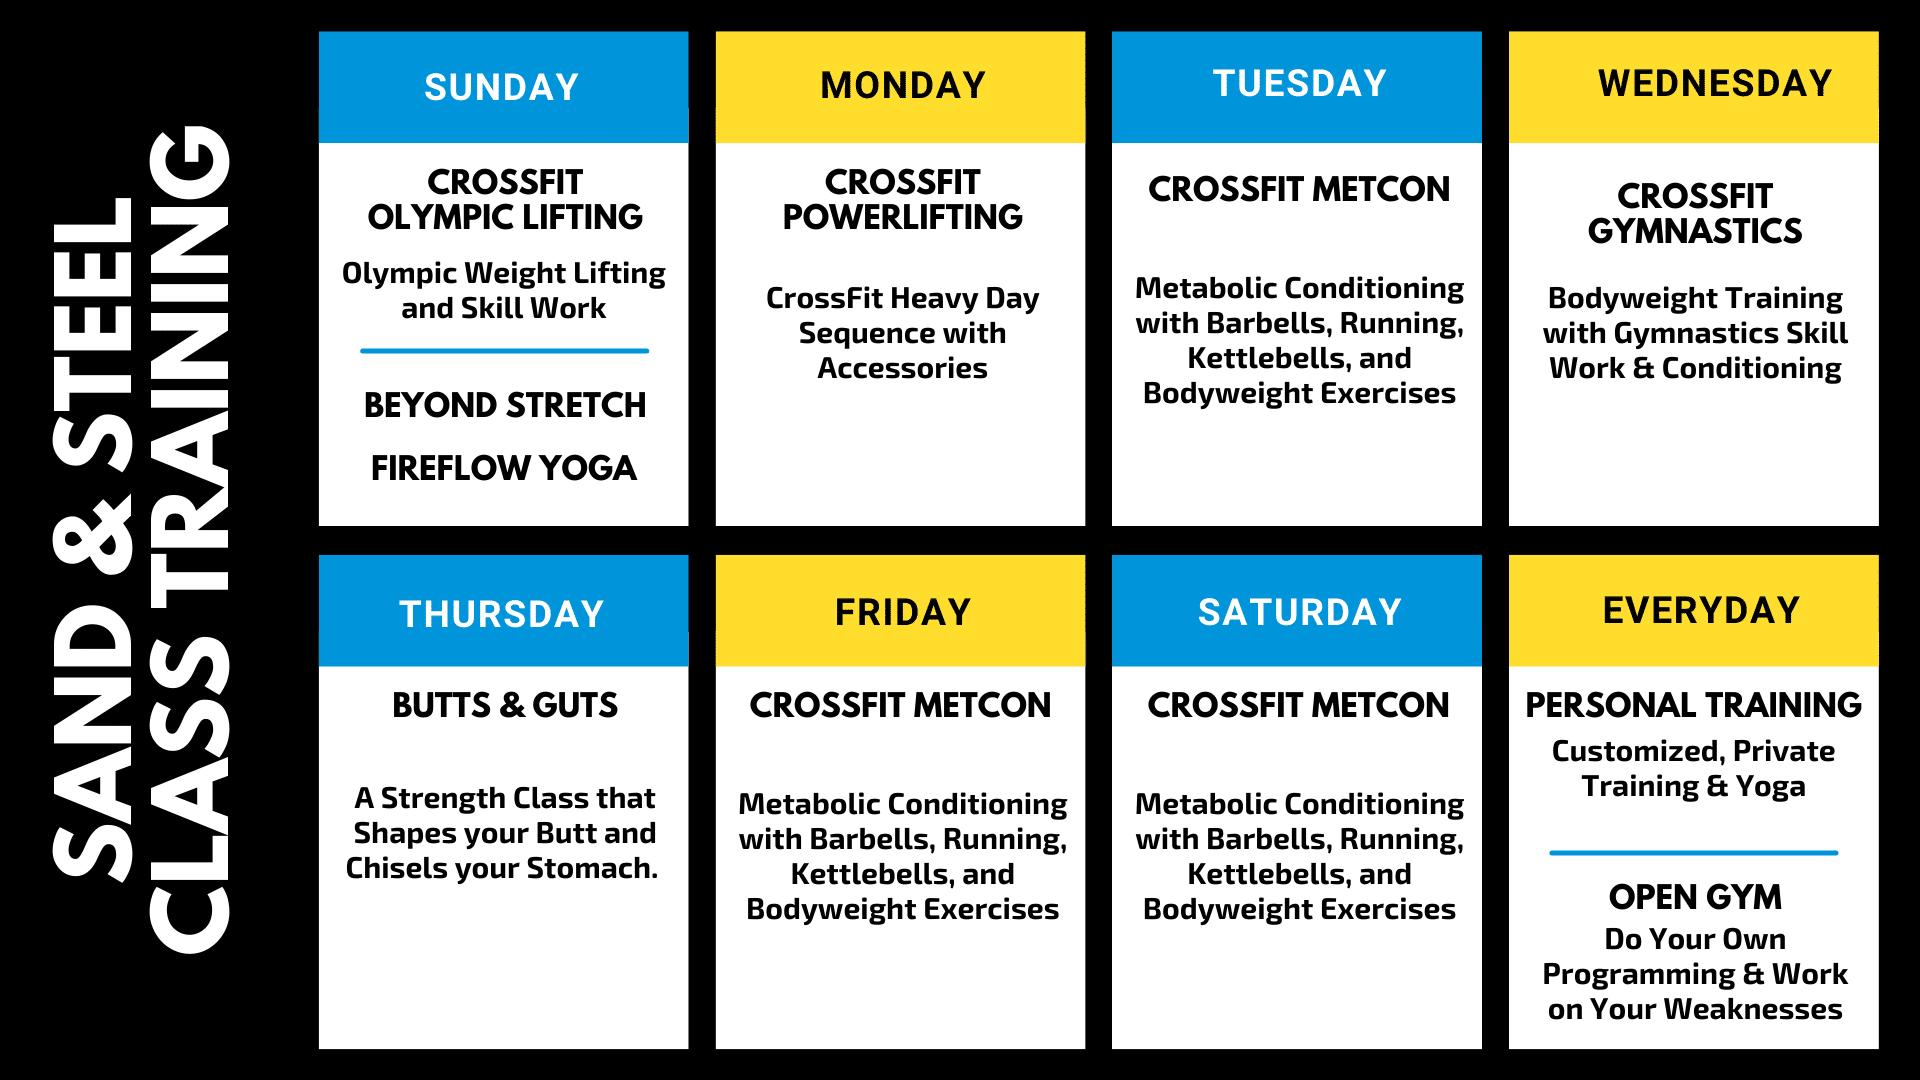 Class Training Cycle